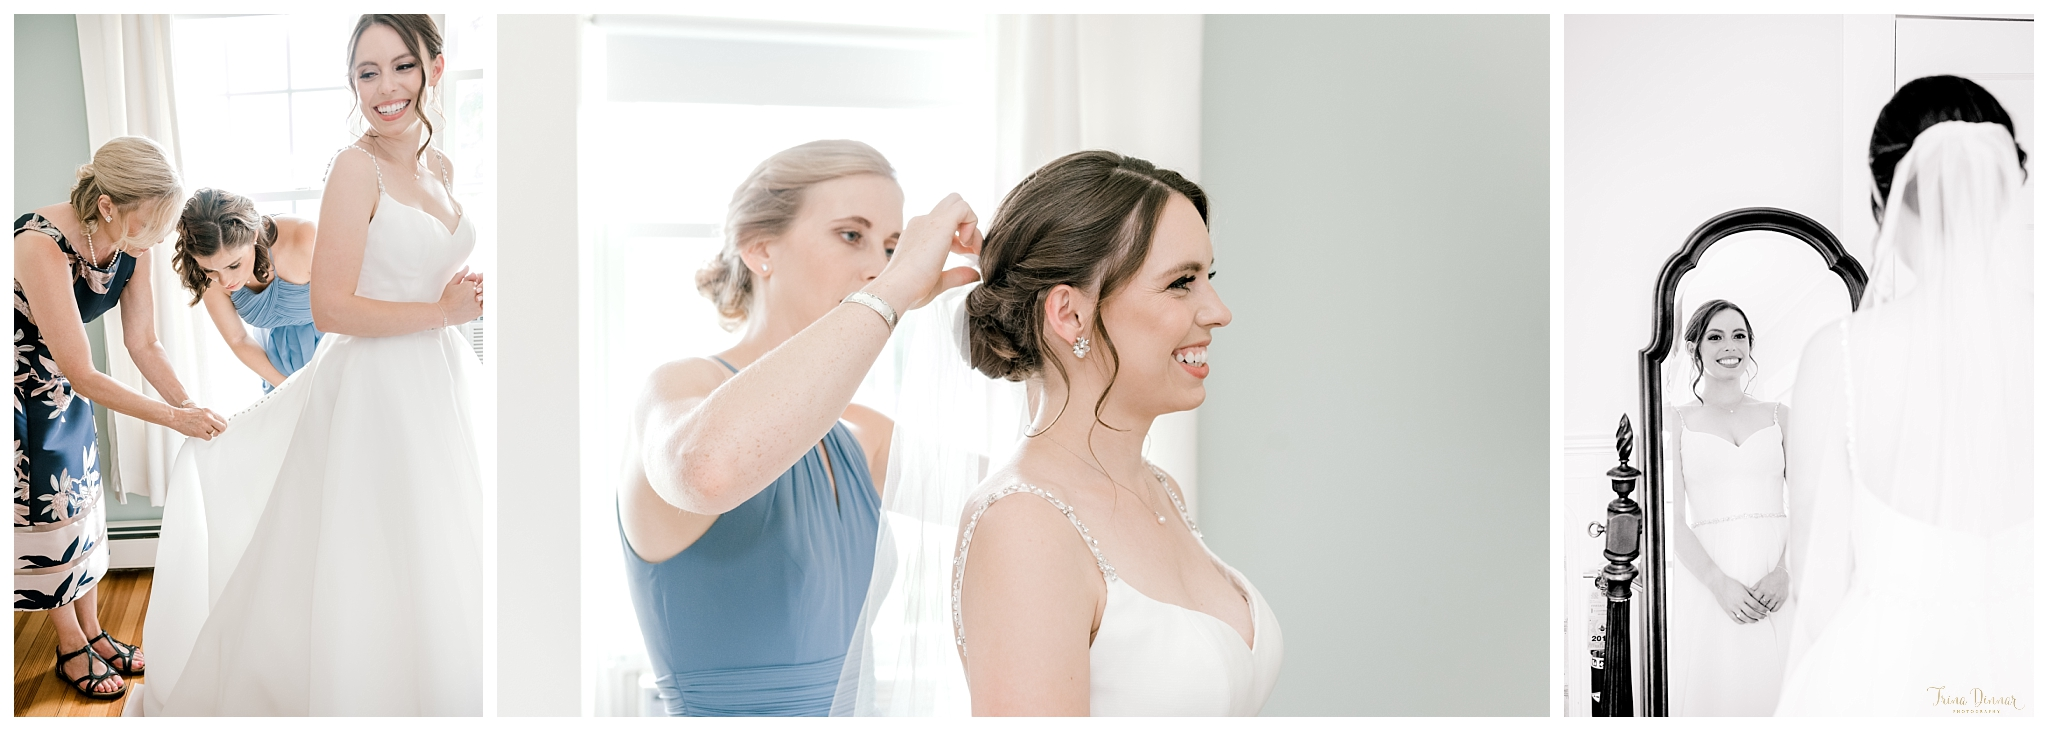 Megan preparing for her York Maine wedding at Harbor Cliffs Inn.